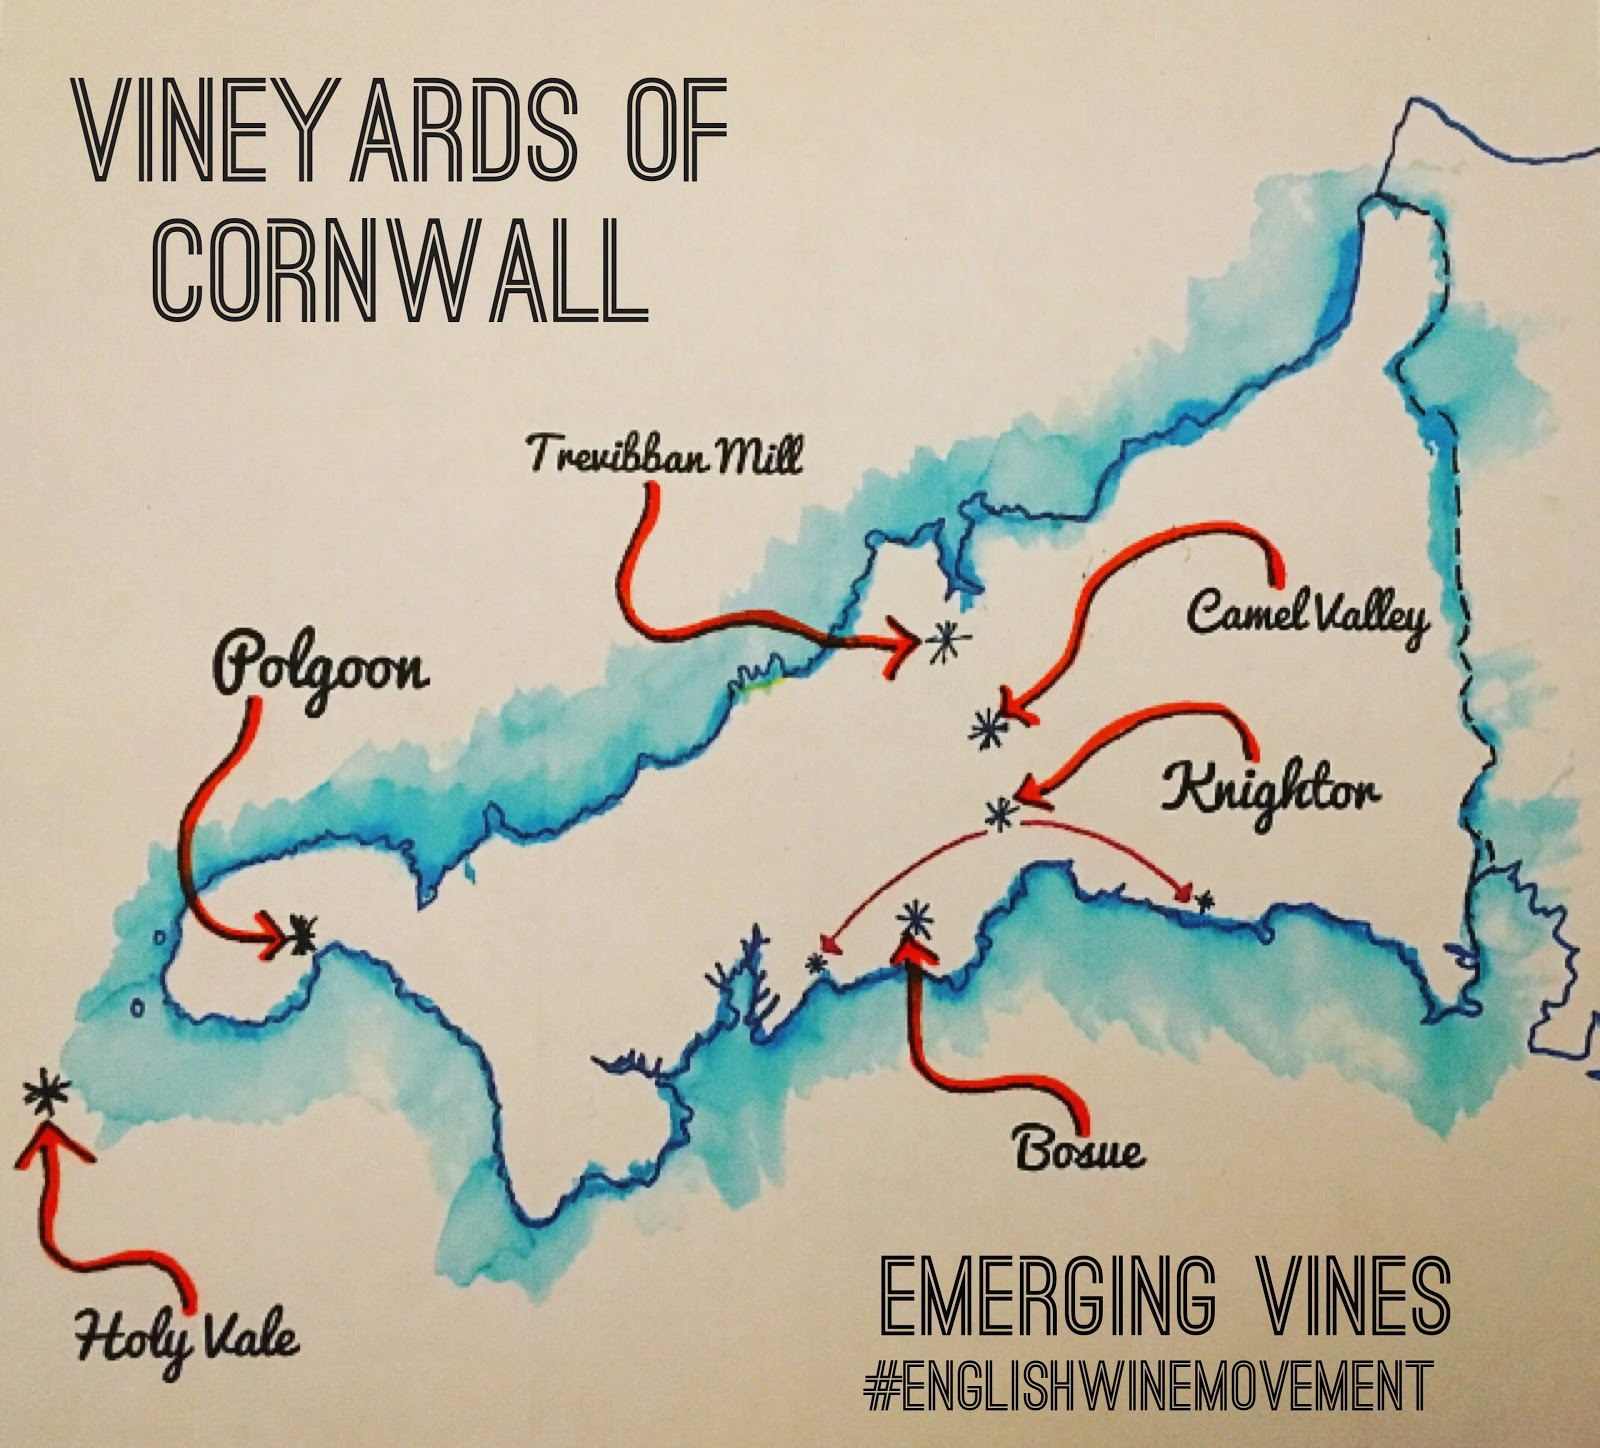 Map of Vineyards in Cornwall